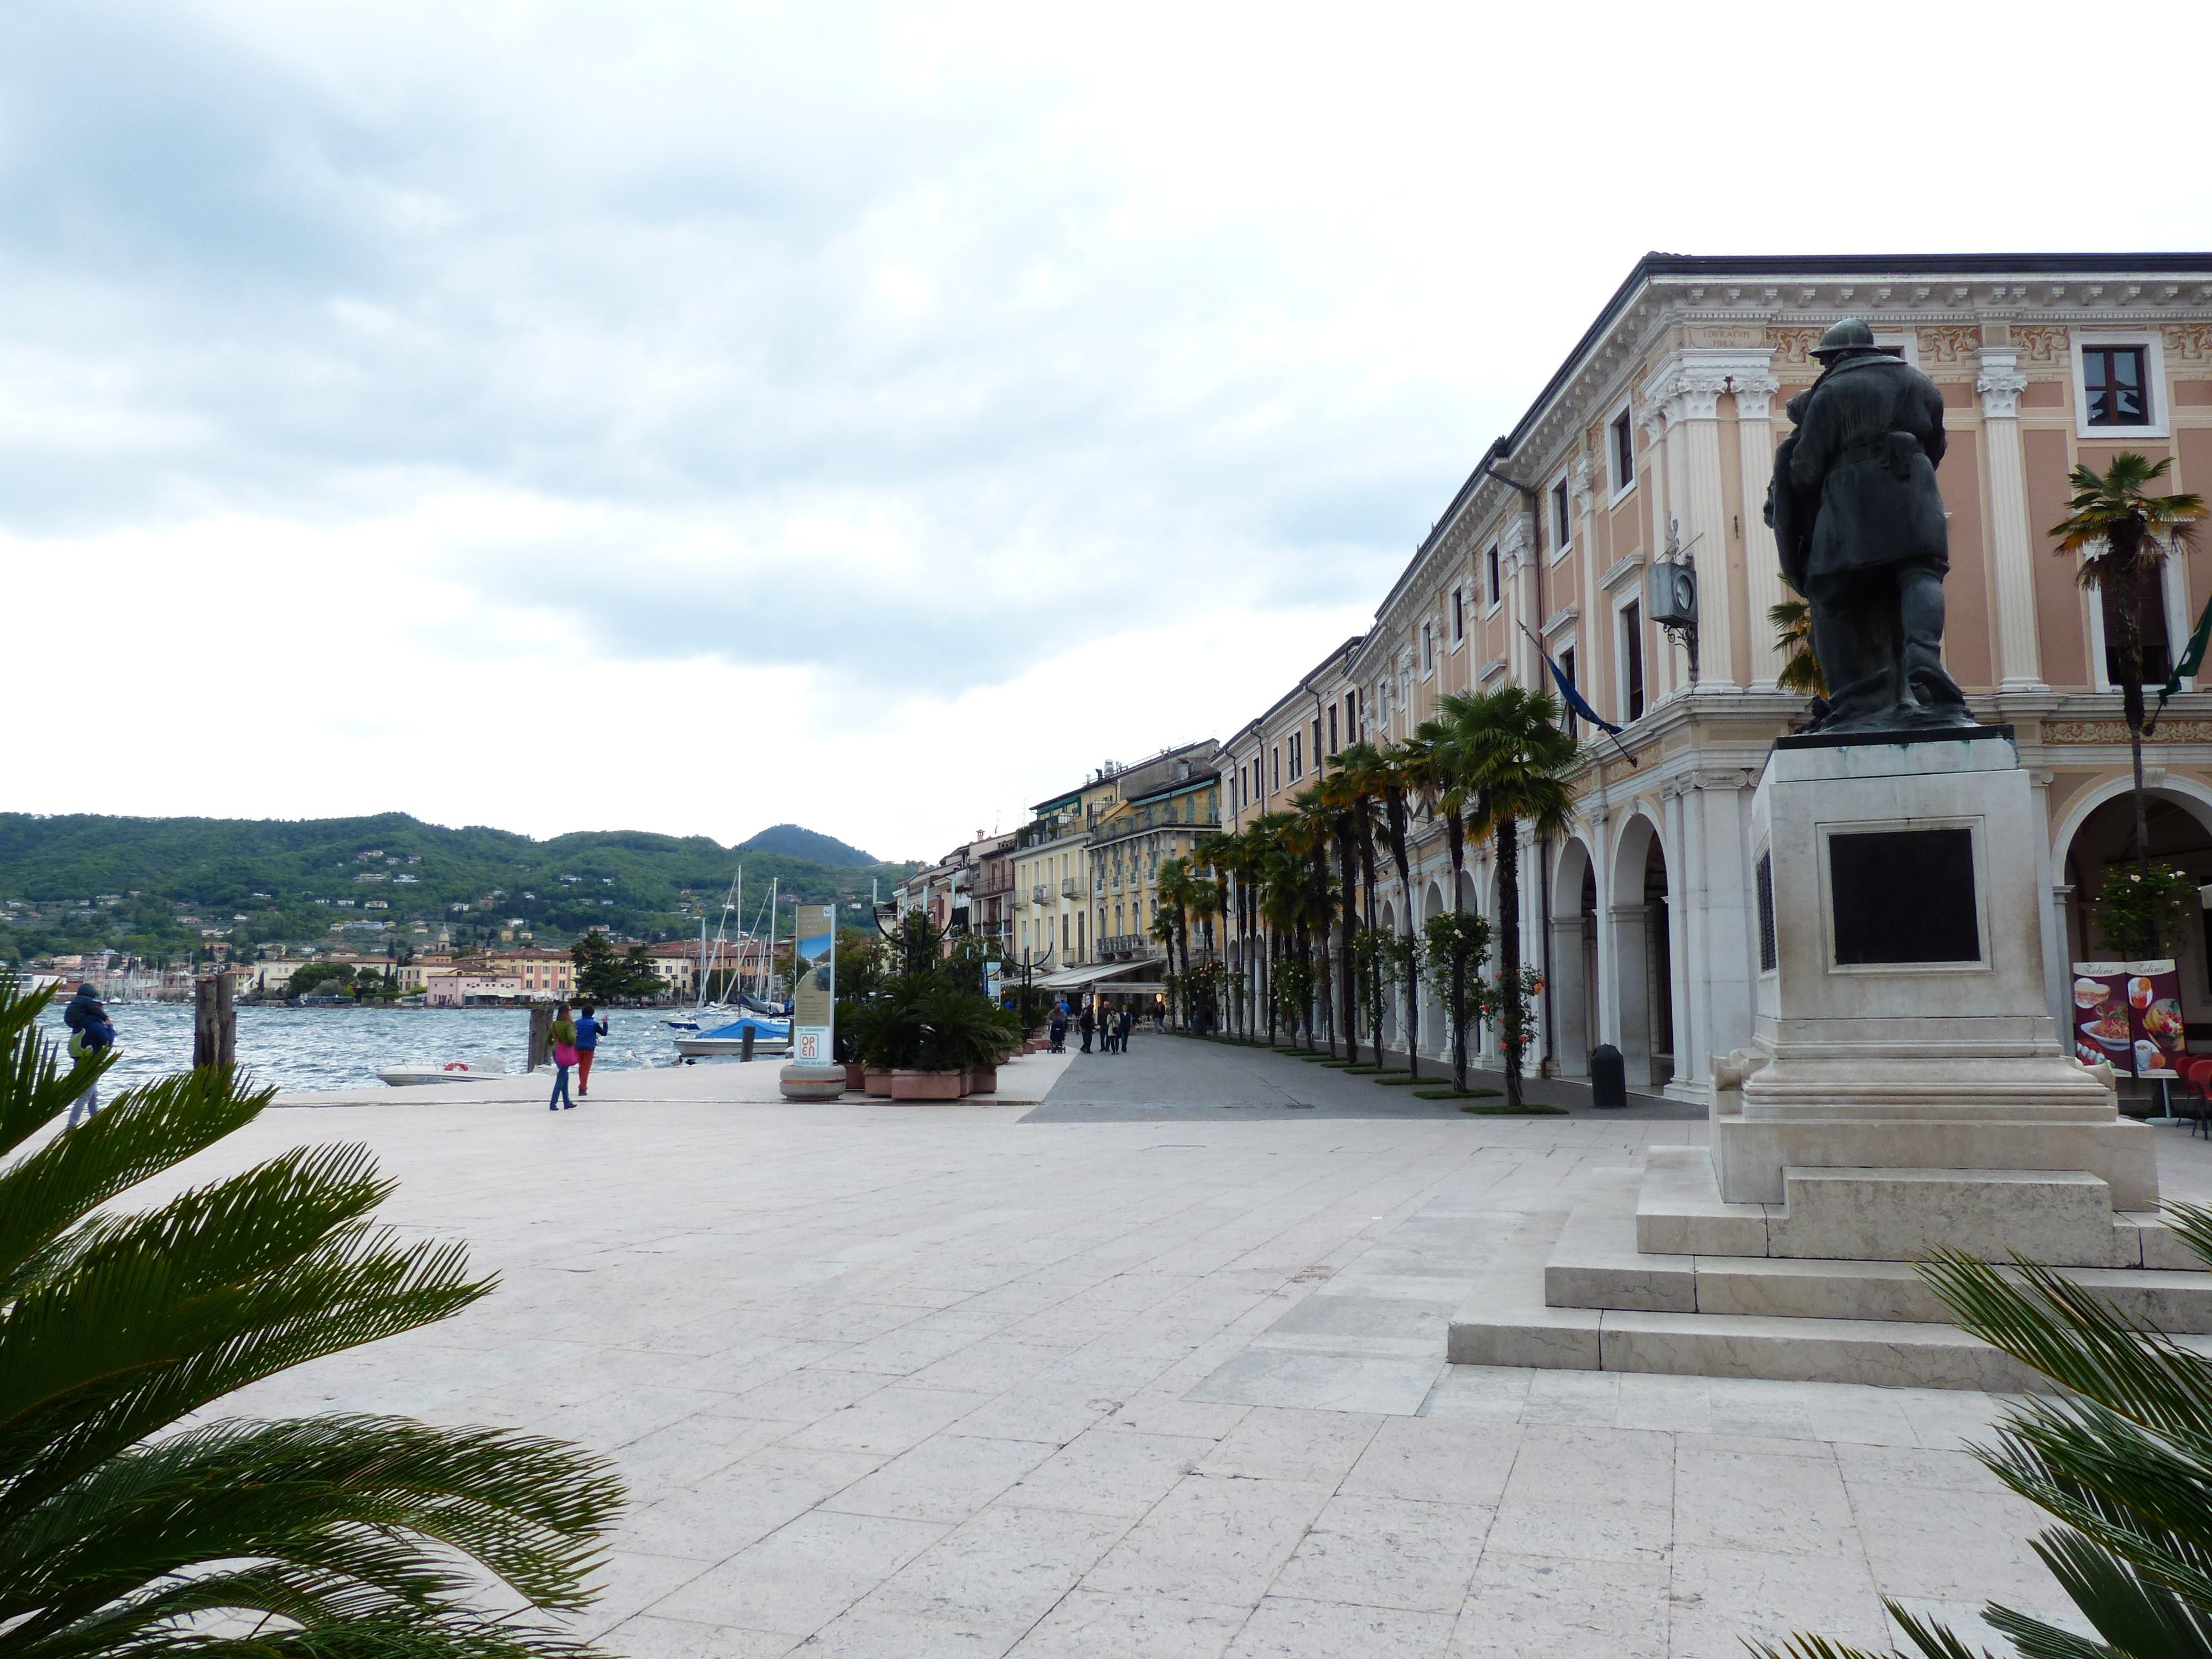 salo italie tourisme - Image